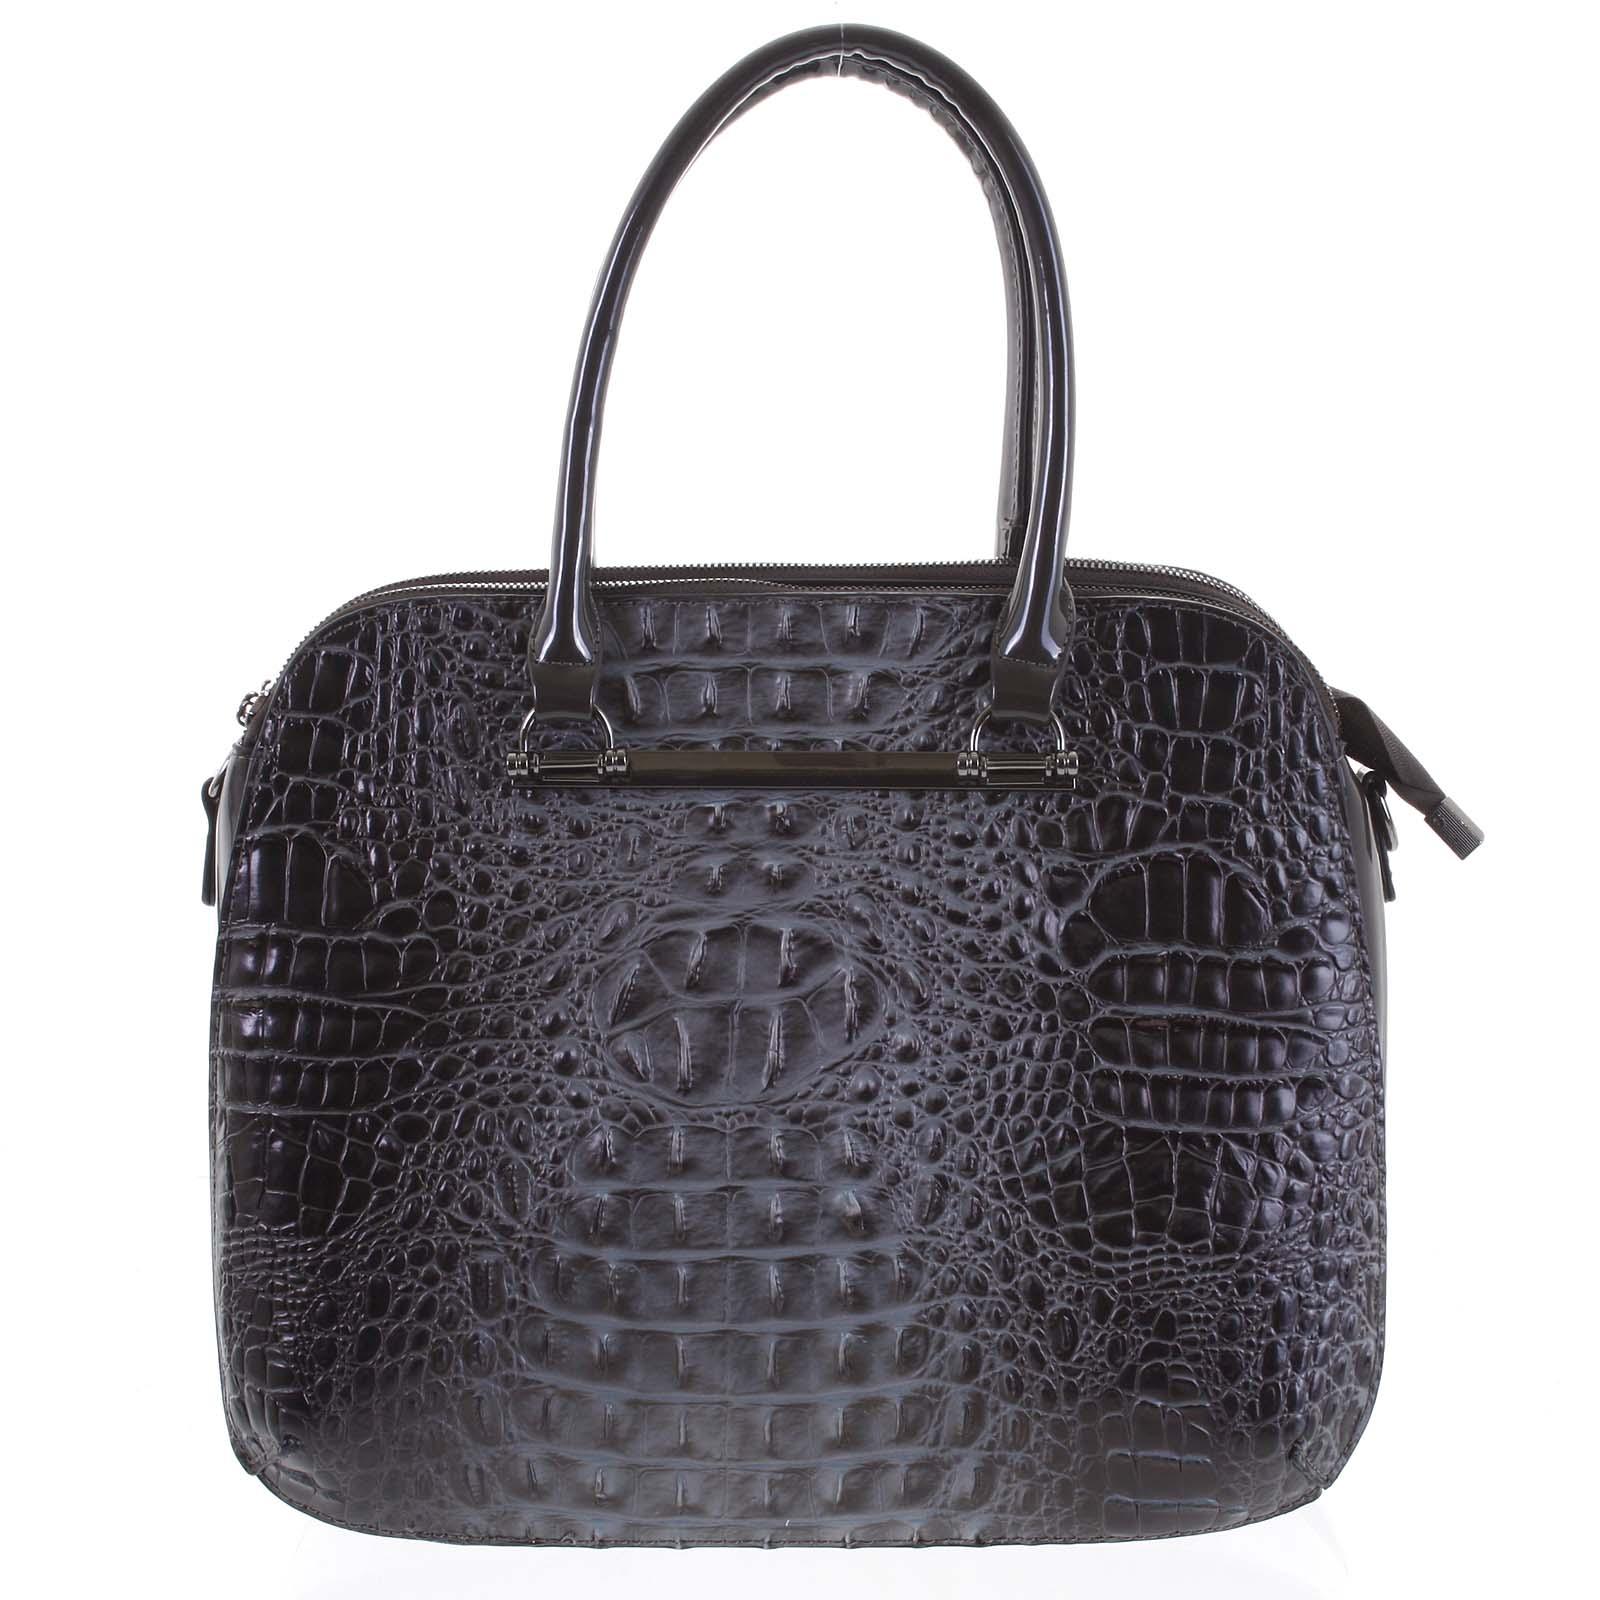 Dámská kabelka do ruky tmavě šedá - Dudlin Lexi